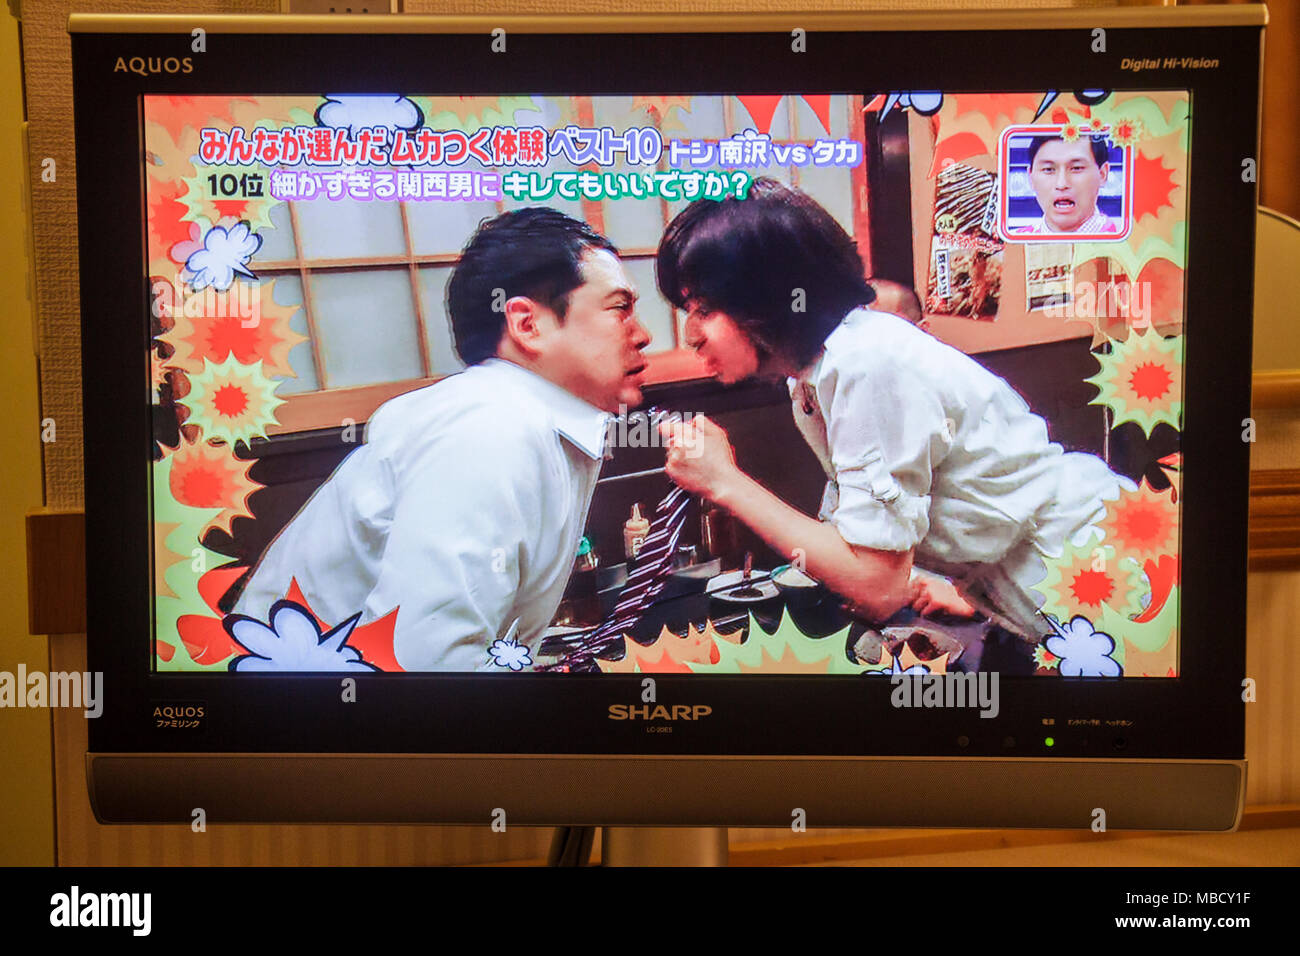 Tokyo Japan Ikebukuro Sharp Aquos widescreen LCD HDTV TV television kanji hiragana katakana characters symbols comedy show Asian - Stock Image